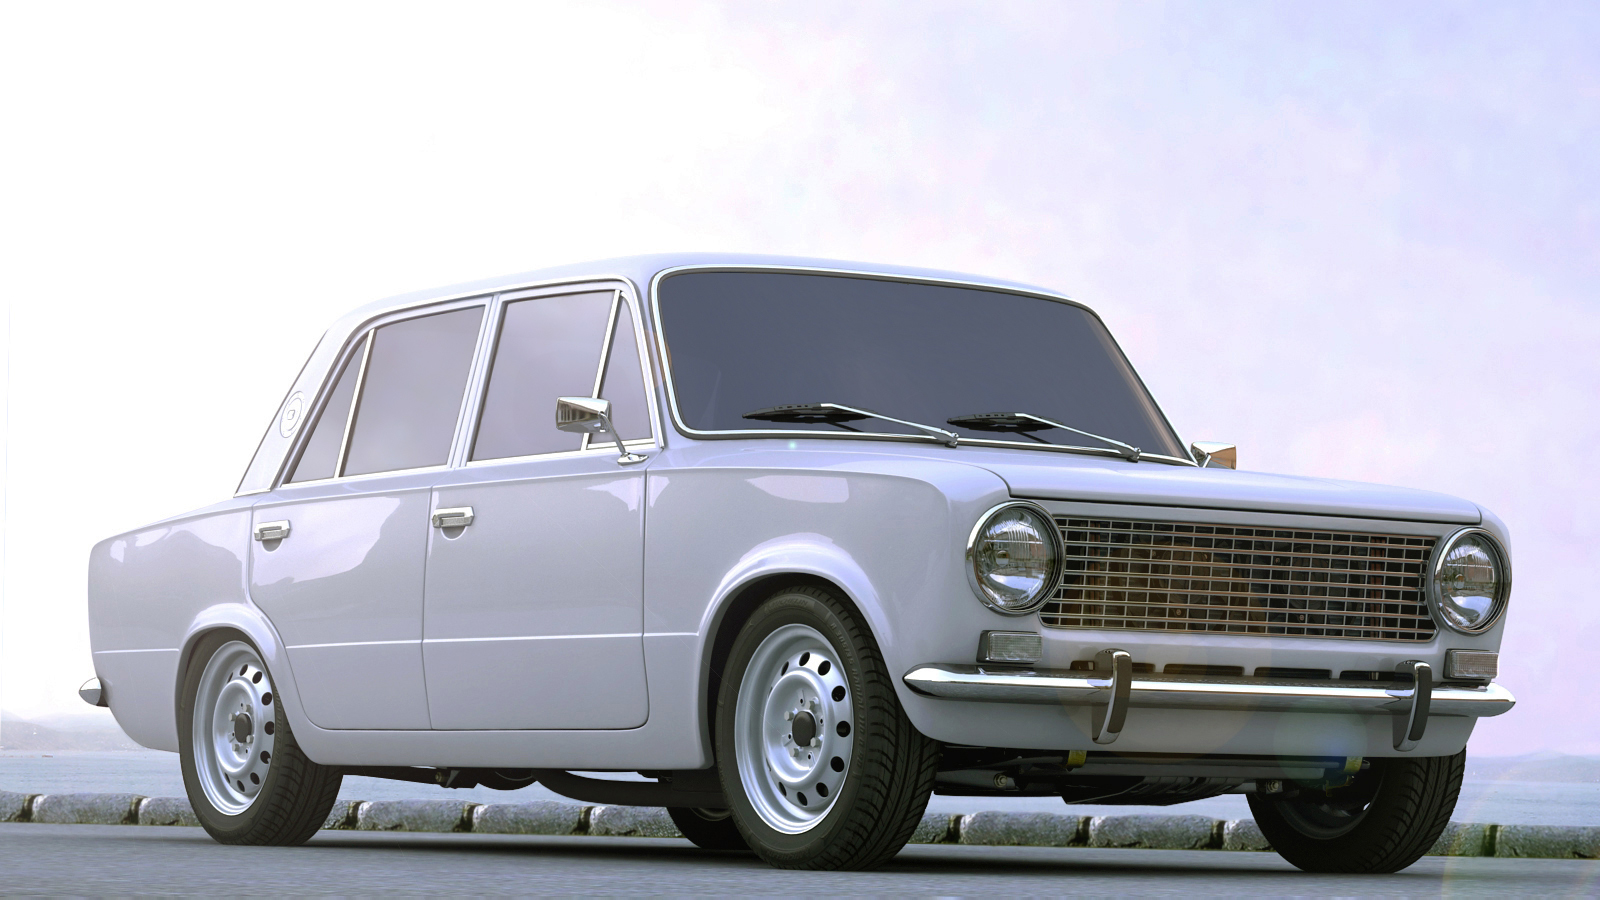 Как подобрать запчасти на ВАЗ 2101?